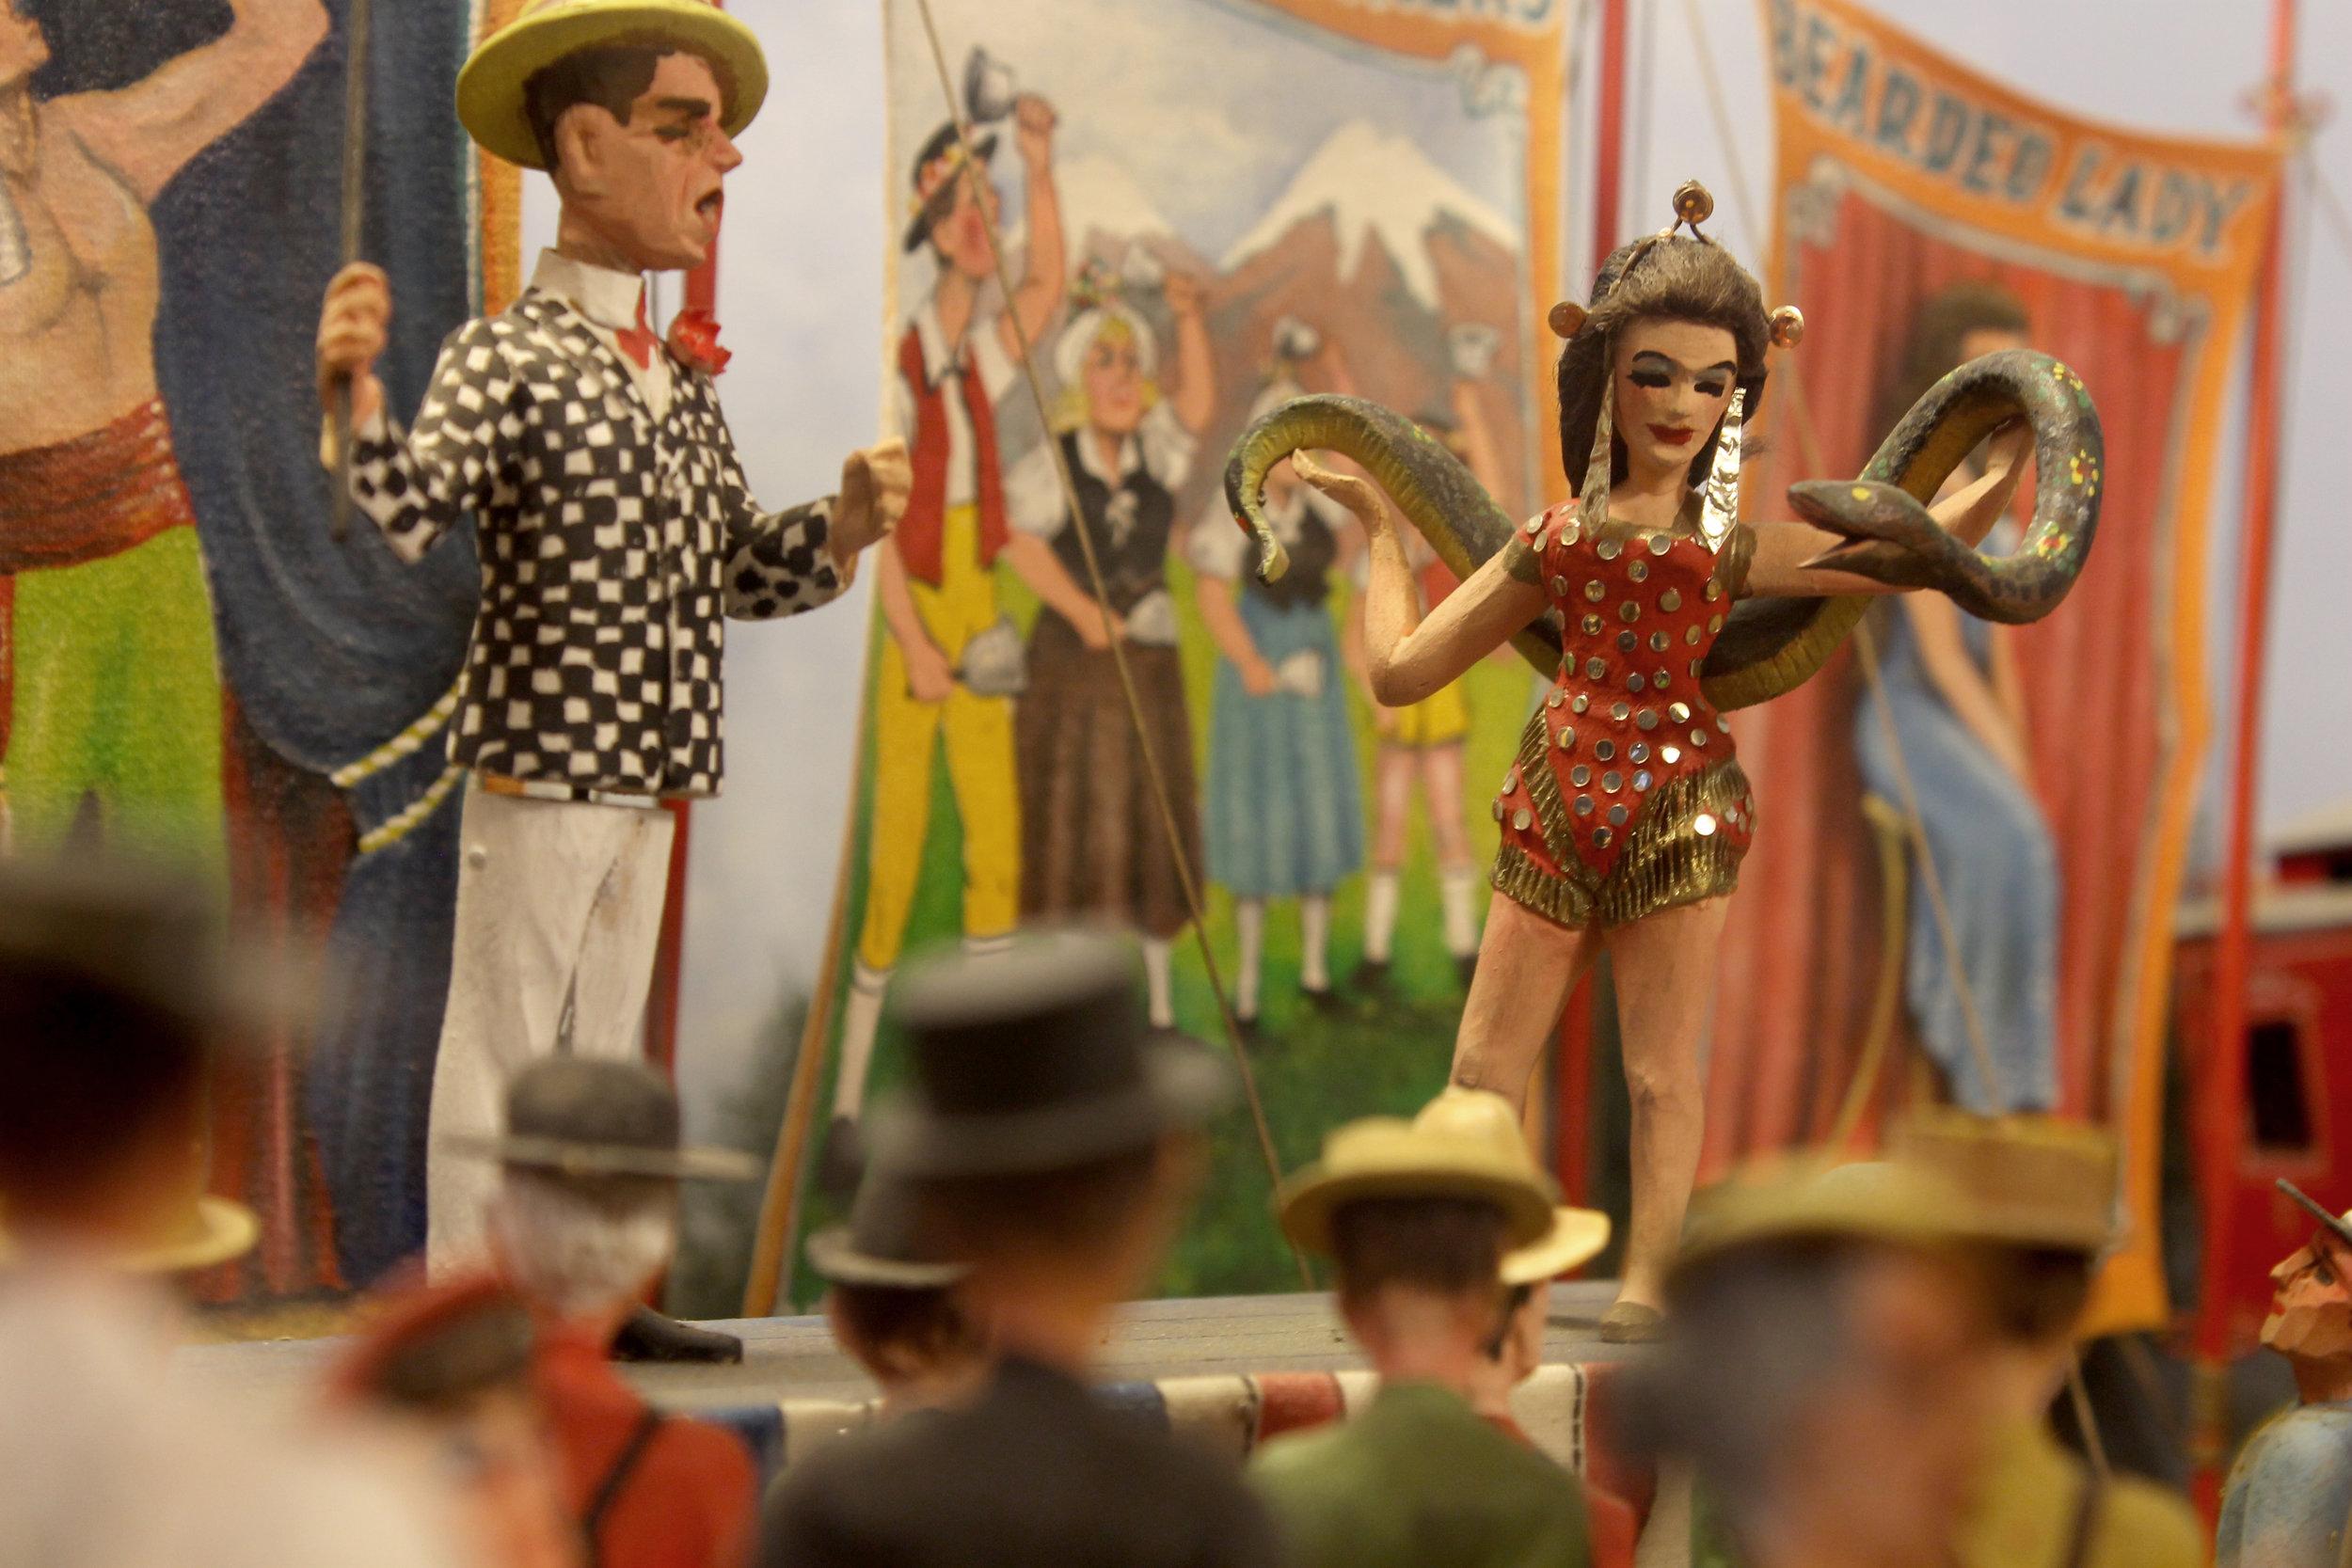 Circus World Museum, Baraboo WI, 2013